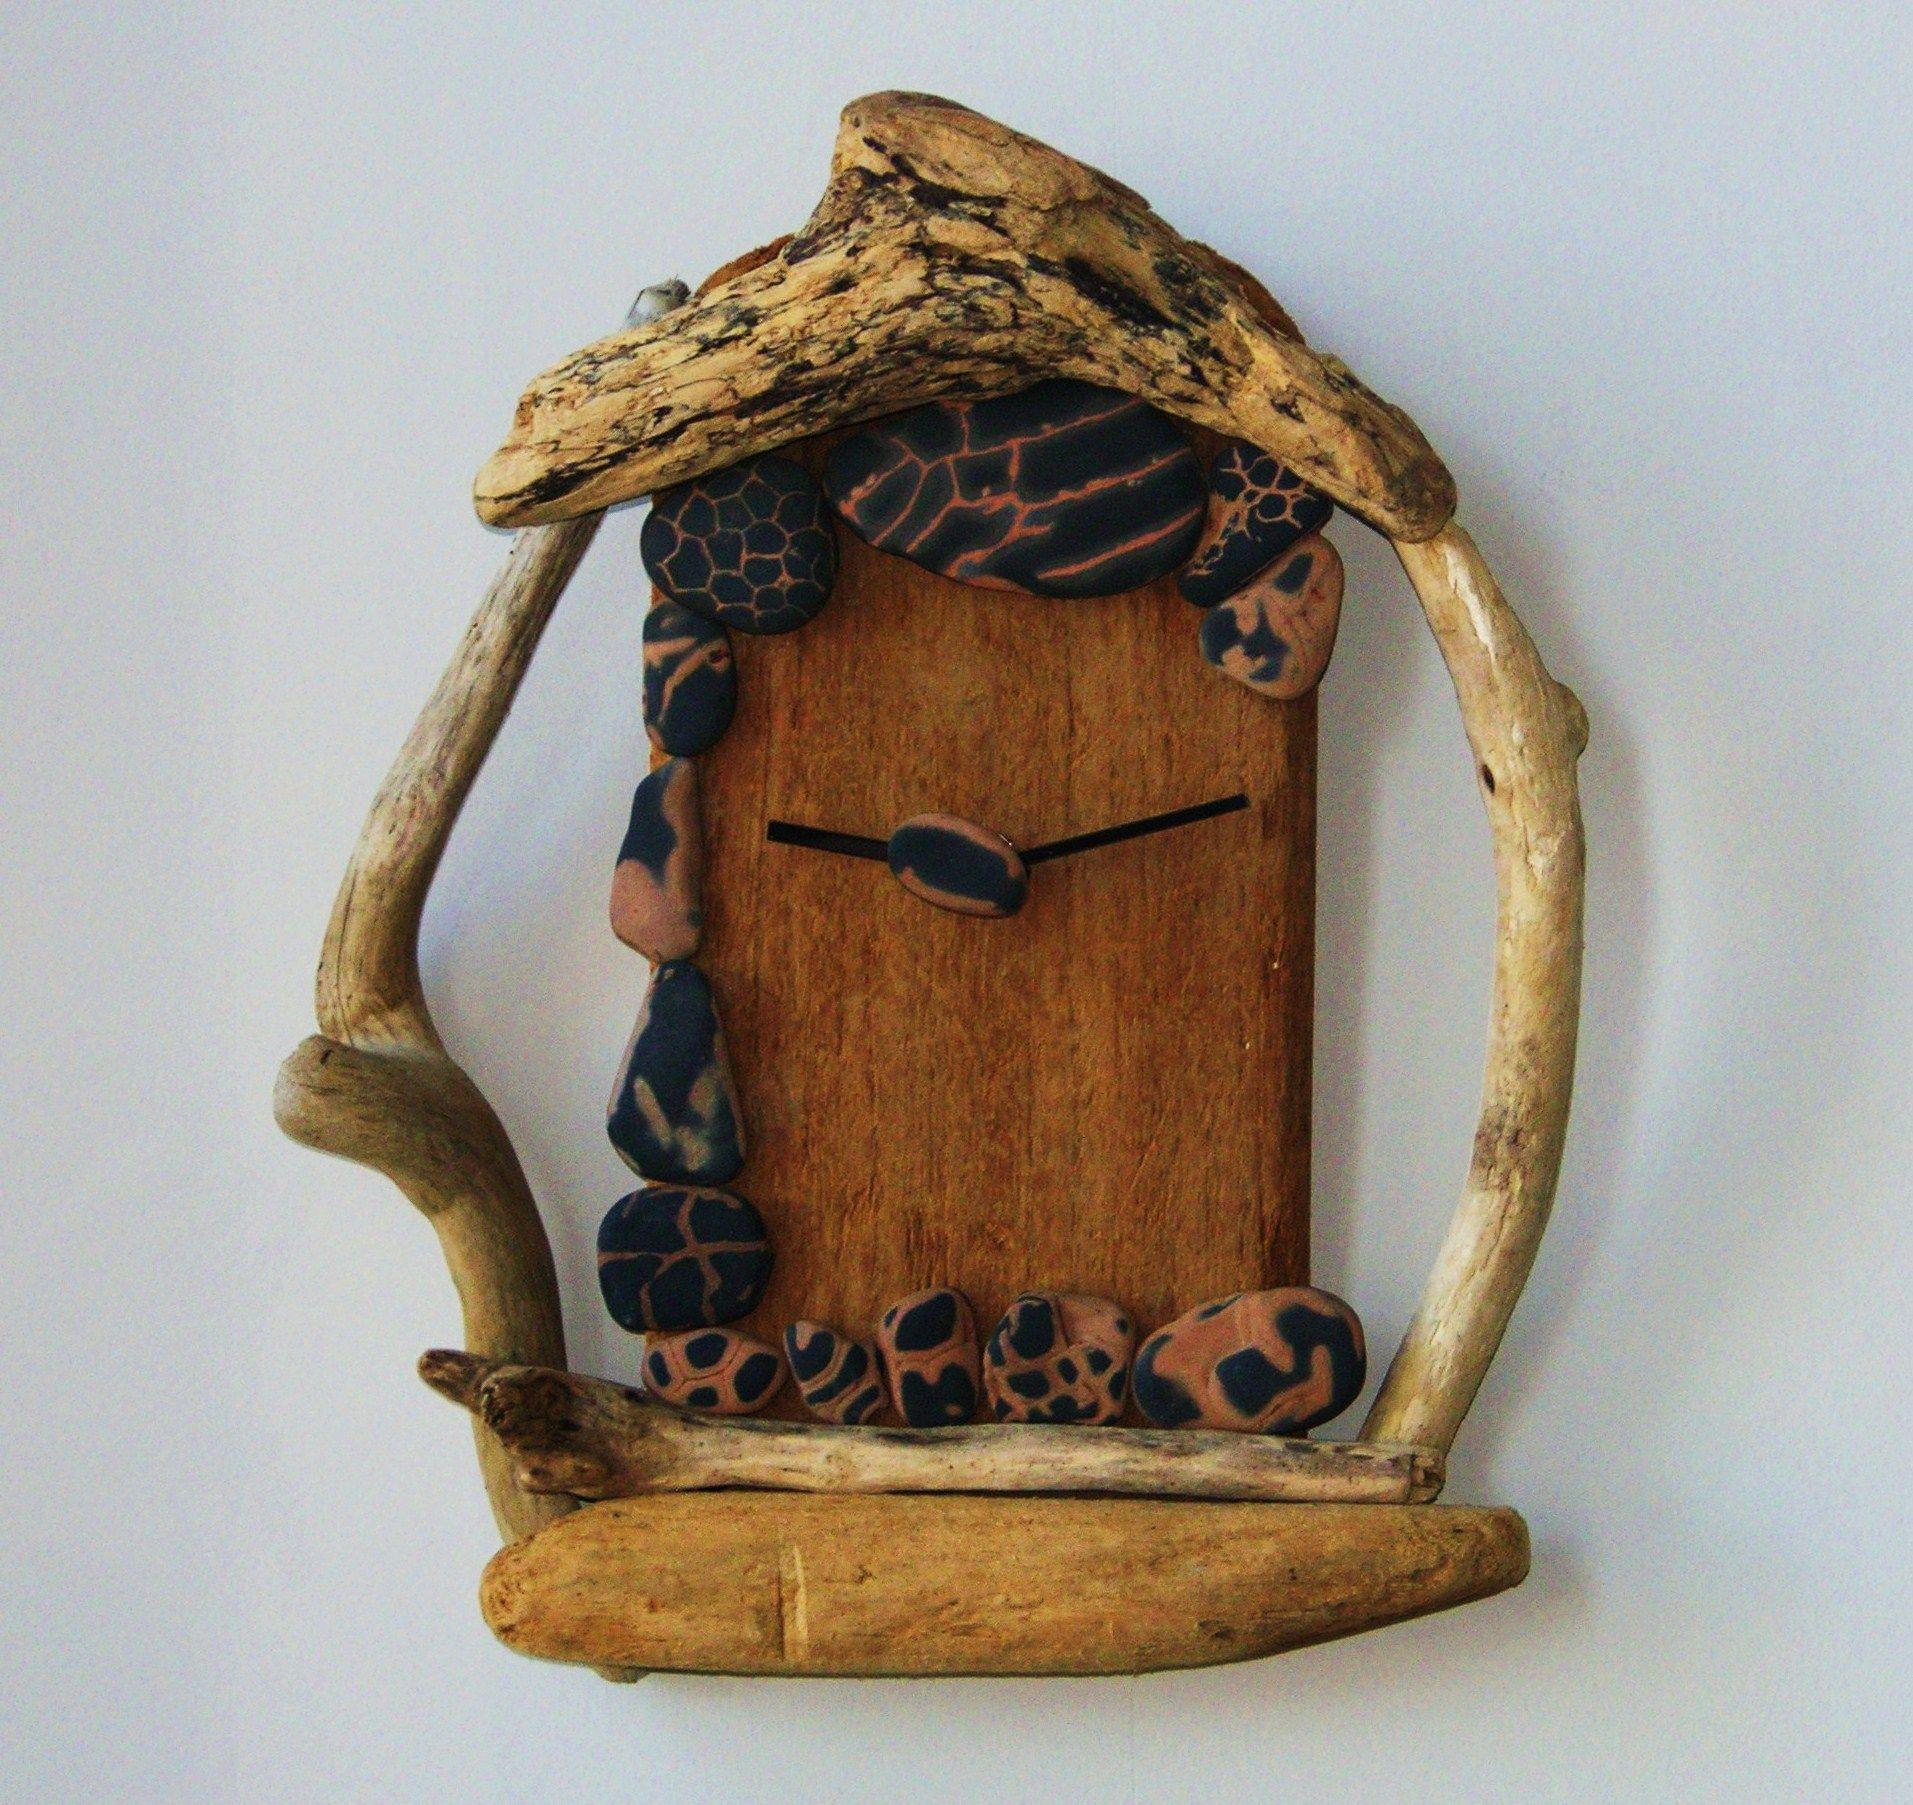 Pin By Julie Howell On Julies Pinterest Driftwood Crafts Crafts